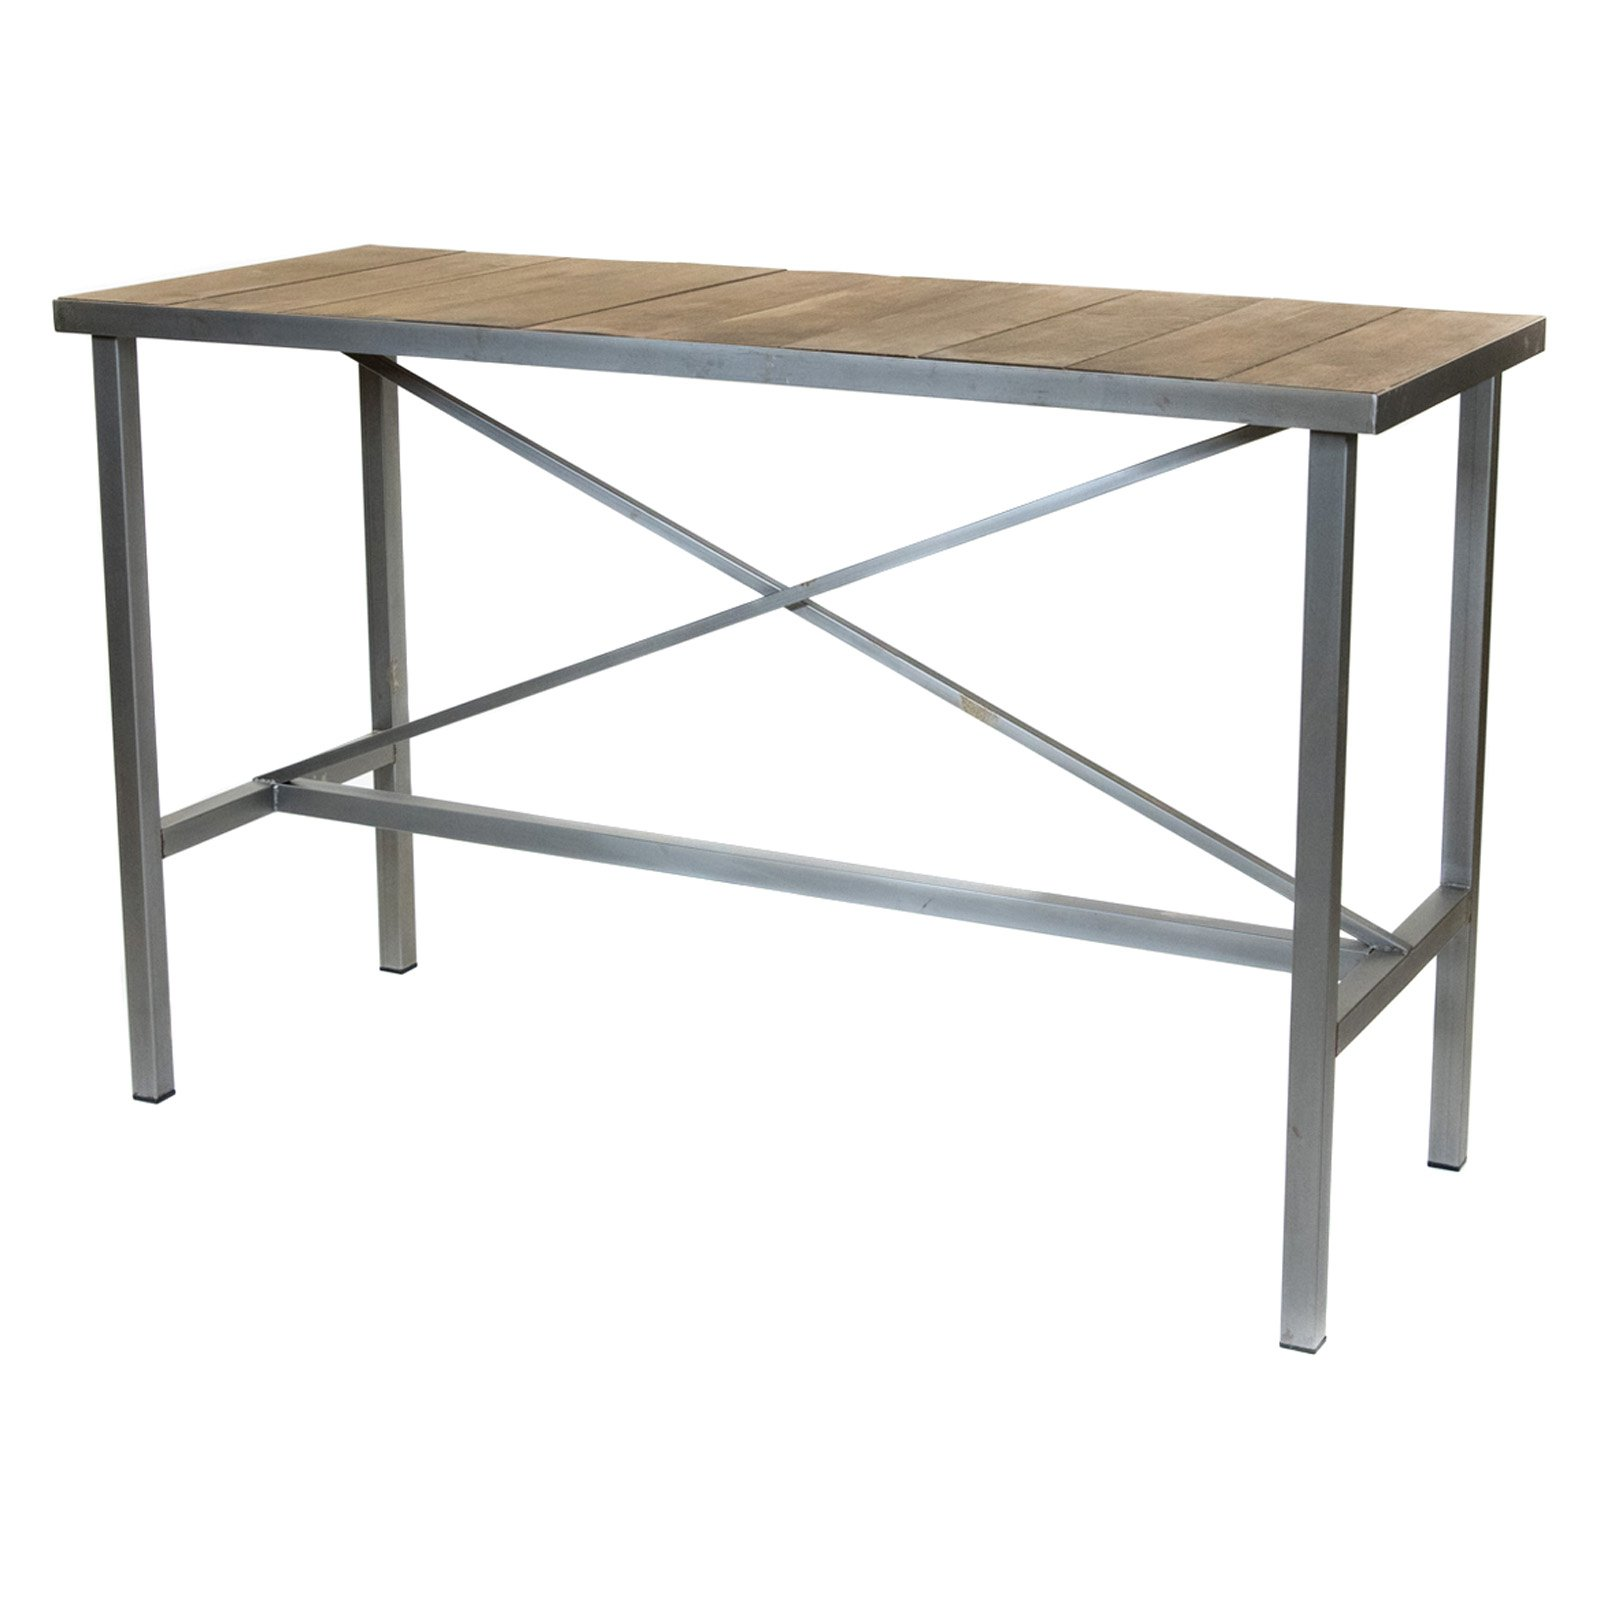 REZ Furniture Vintage 63 in. Bar Height Rectangular Dining Table